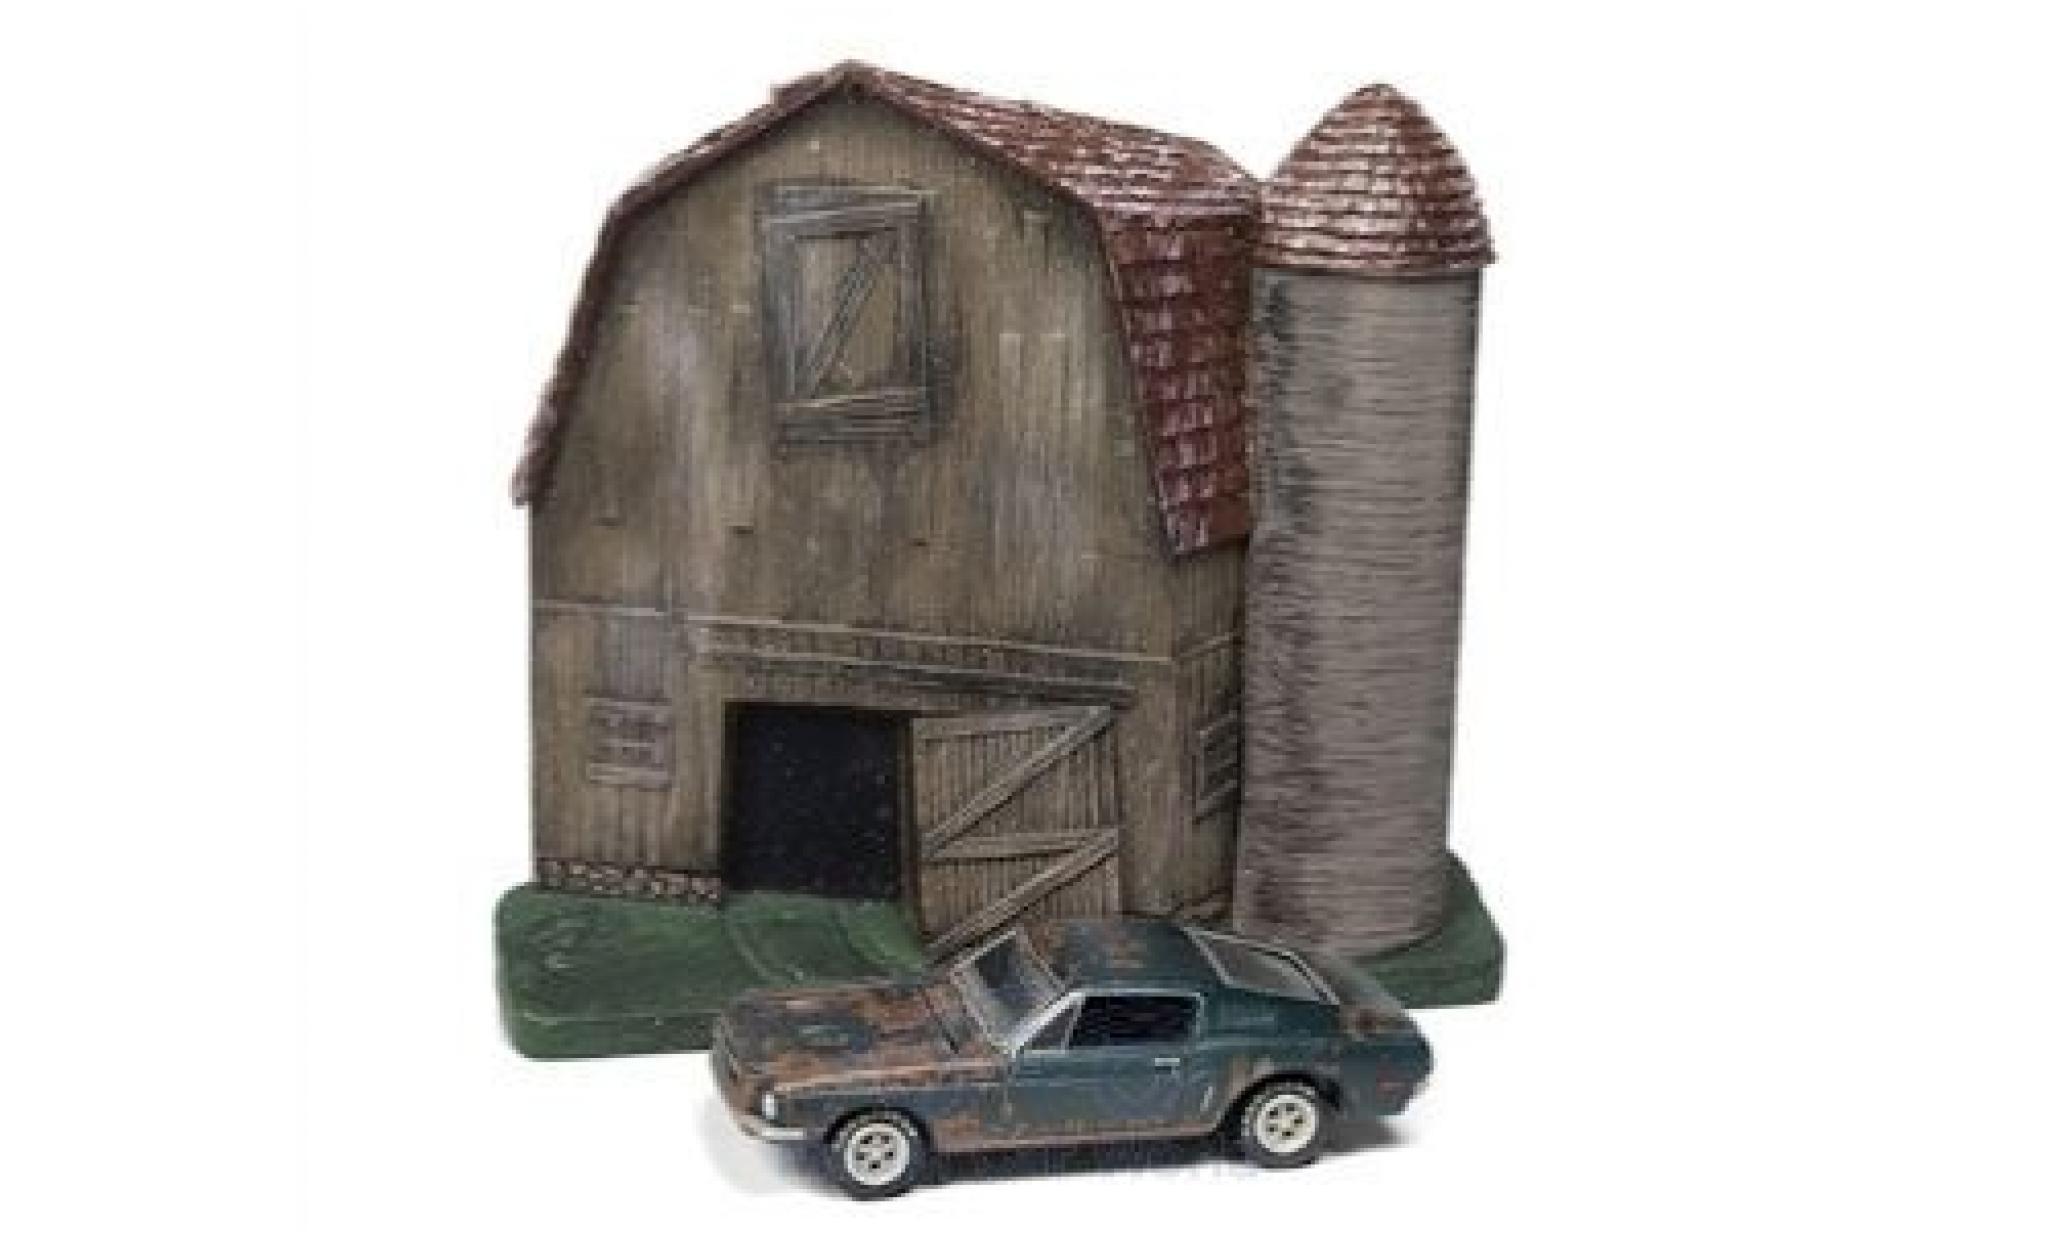 Ford Mustang 1/64 Johnny Lightning GT Fastback green 1968 Barn Finds Series 4 Diorama mit Witterungsspuren